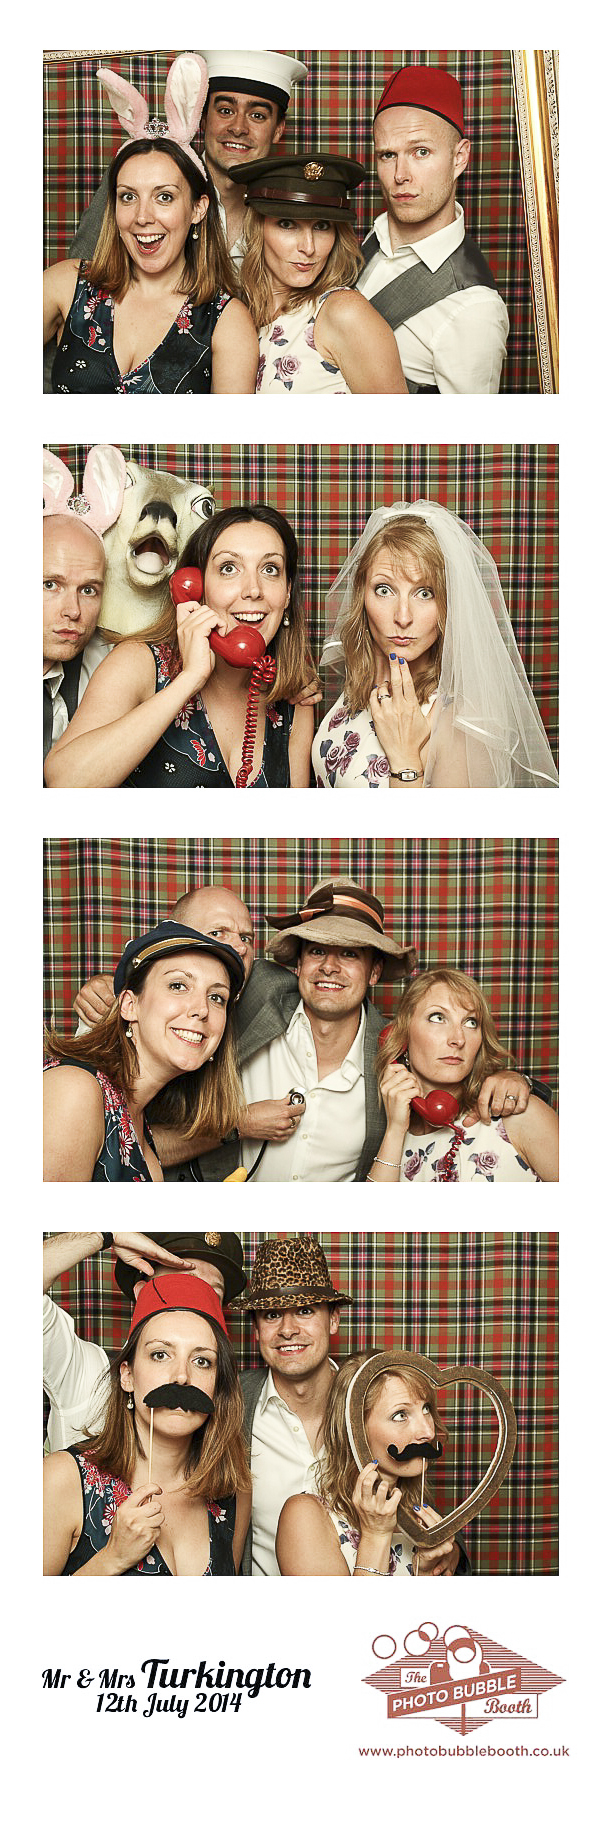 Mr & Mrs Turkington Photobooth _8.JPG